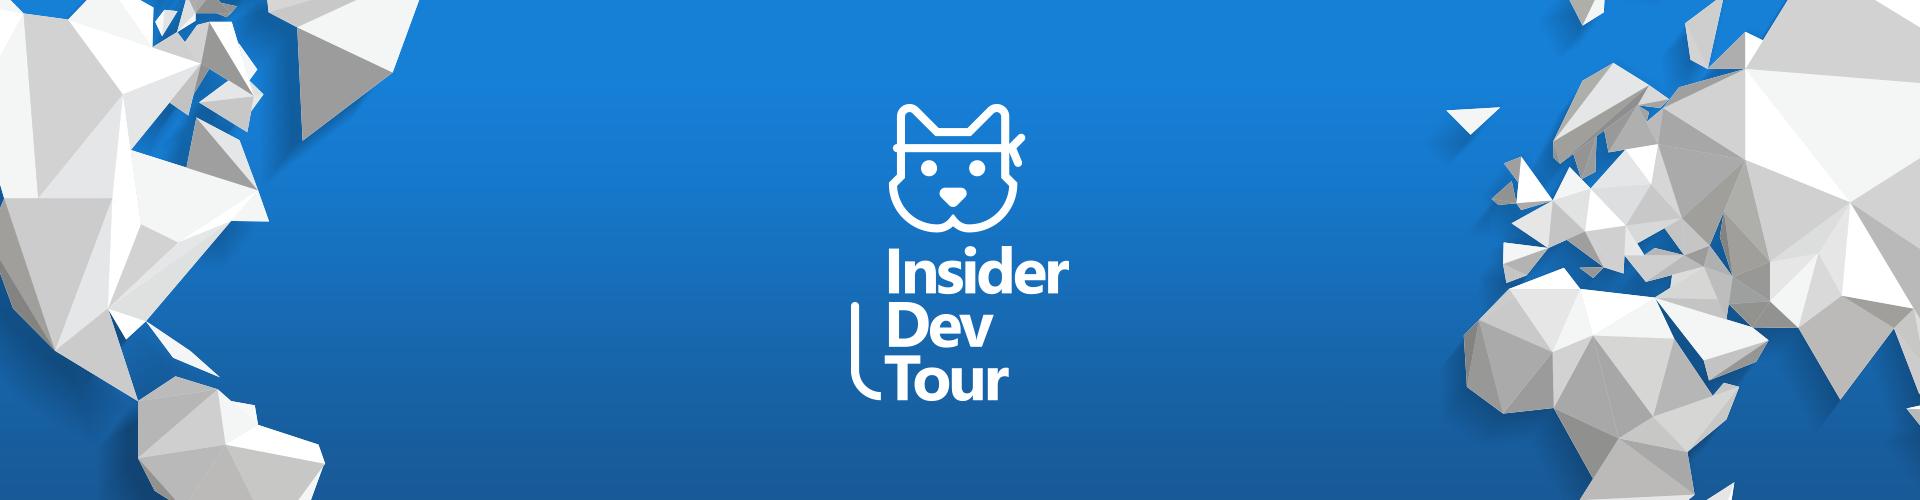 Insider Dev Tour: прямая трансляция - 1